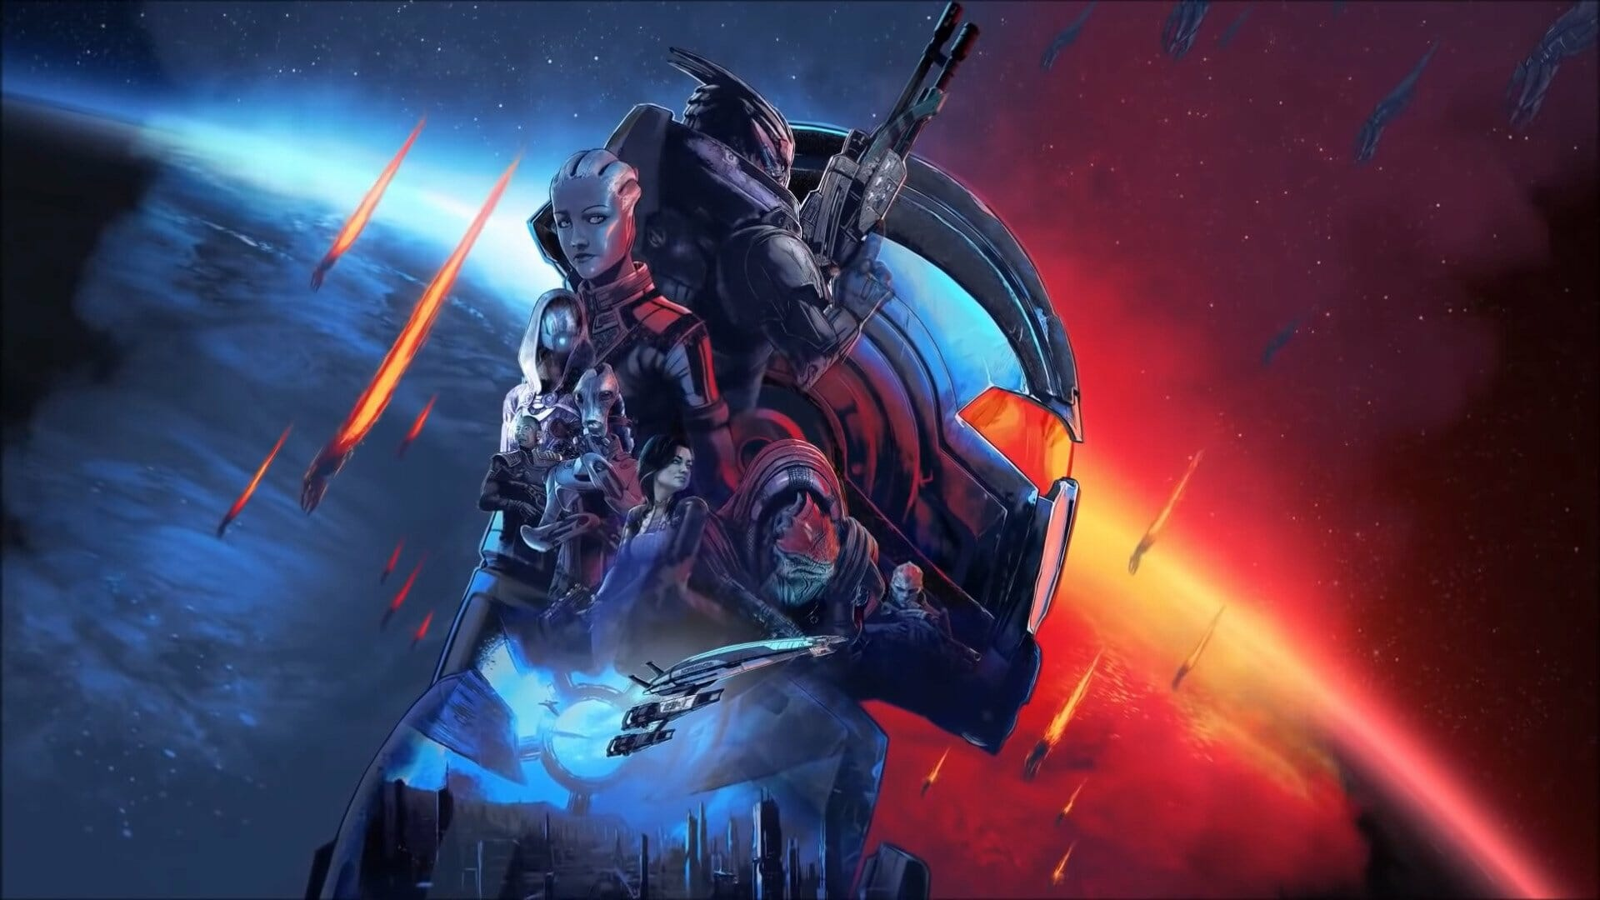 Mass Effect: Why Commander Shepard's Return Next Month is Huge 1